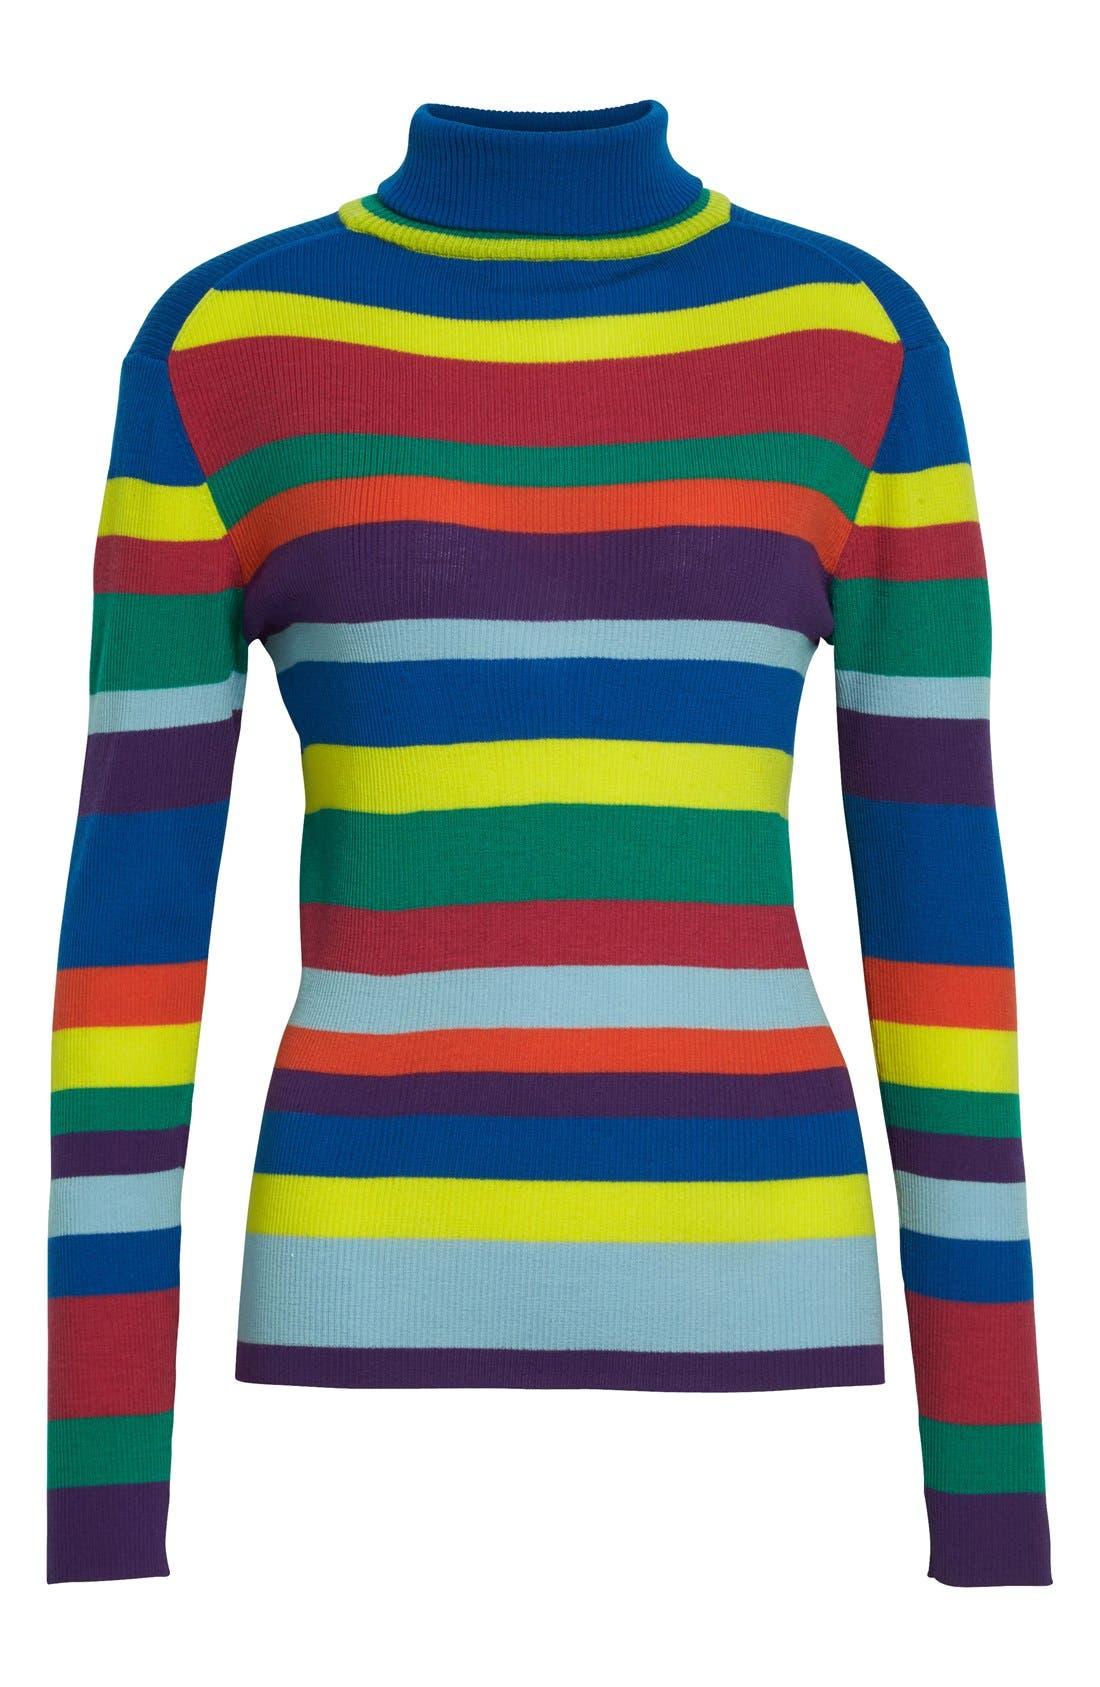 Stripe Merino Wool Turtleneck,                             Alternate thumbnail 3, color,                             960